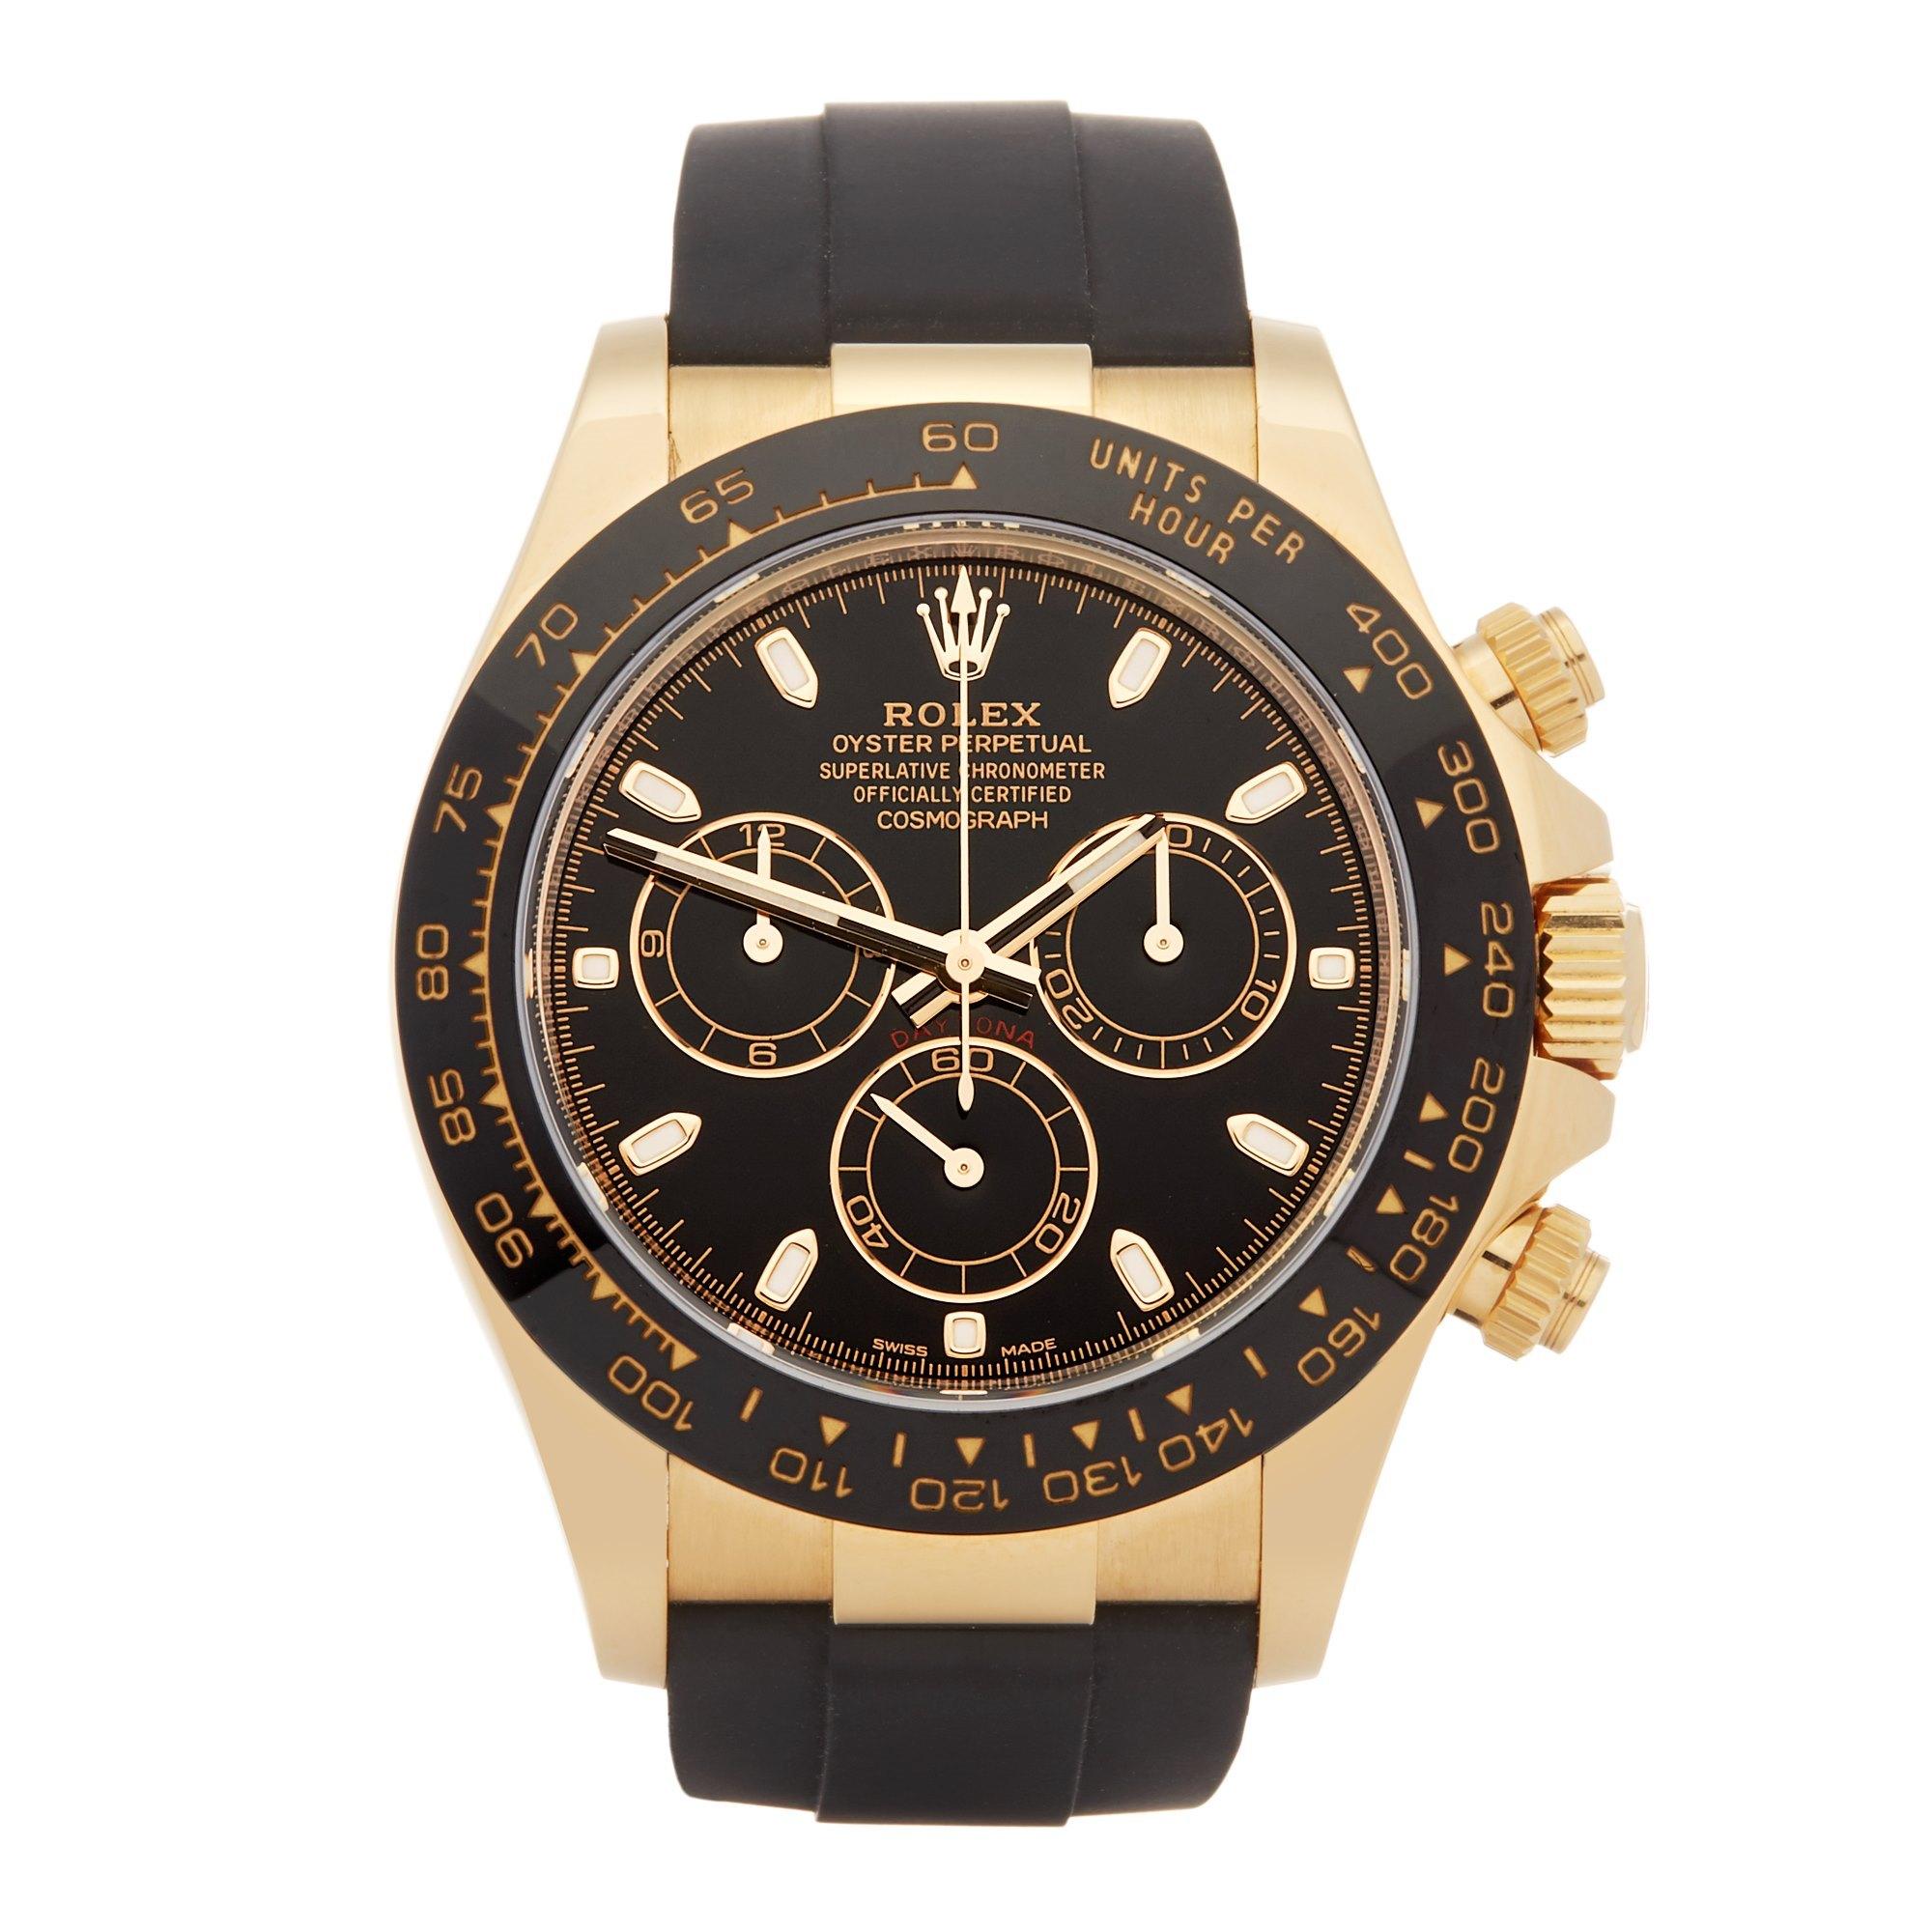 Rolex Daytona Chronograph Yellow Gold 116518LN